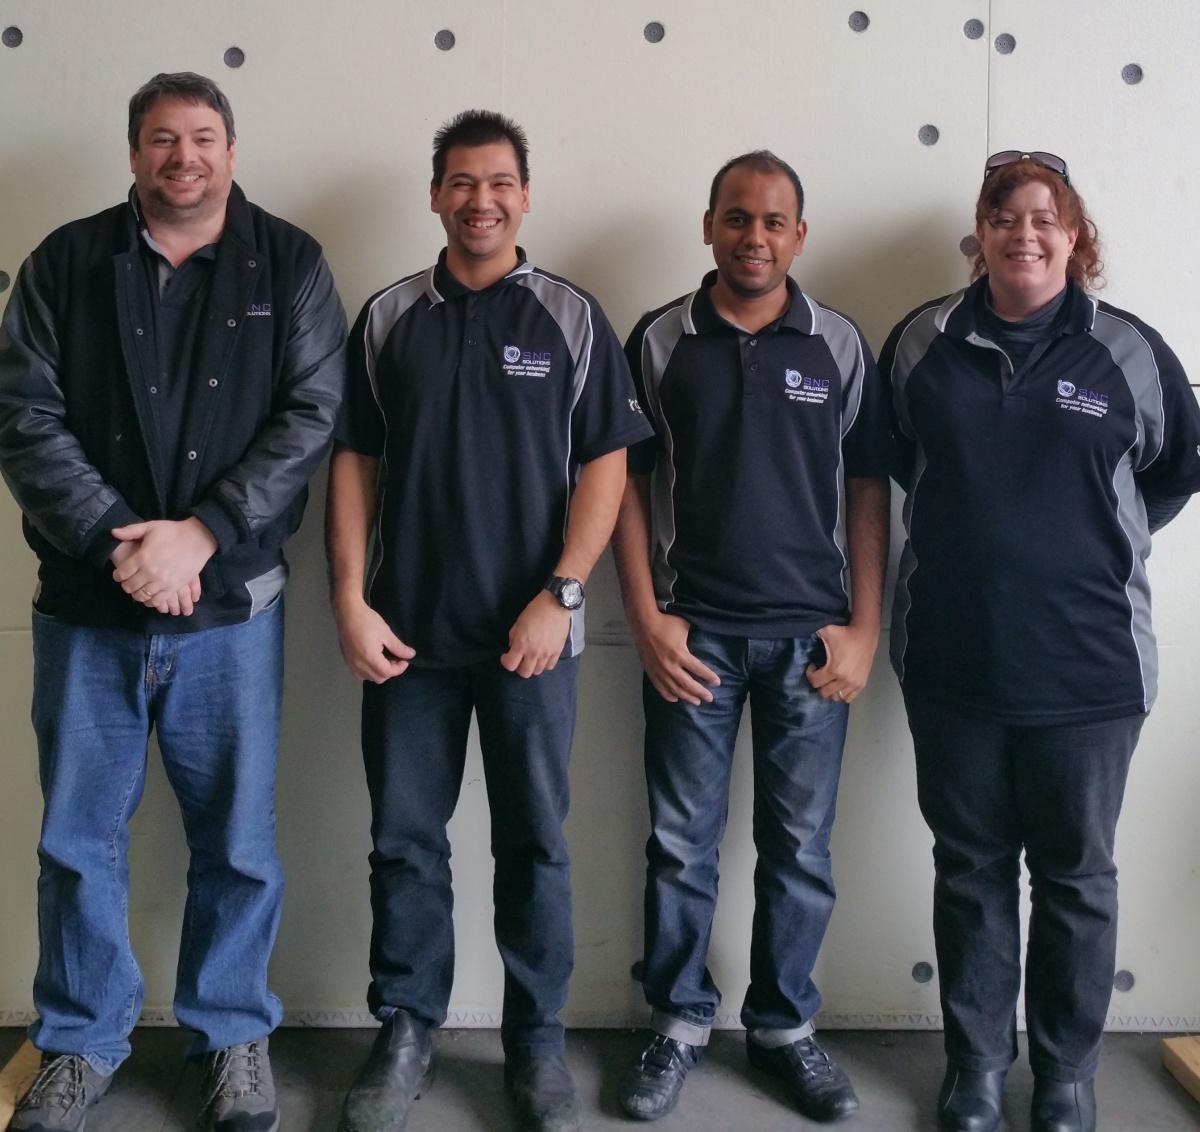 SNC Solutions is new partner Plan-de-CAMpagne (ERP) in Australia